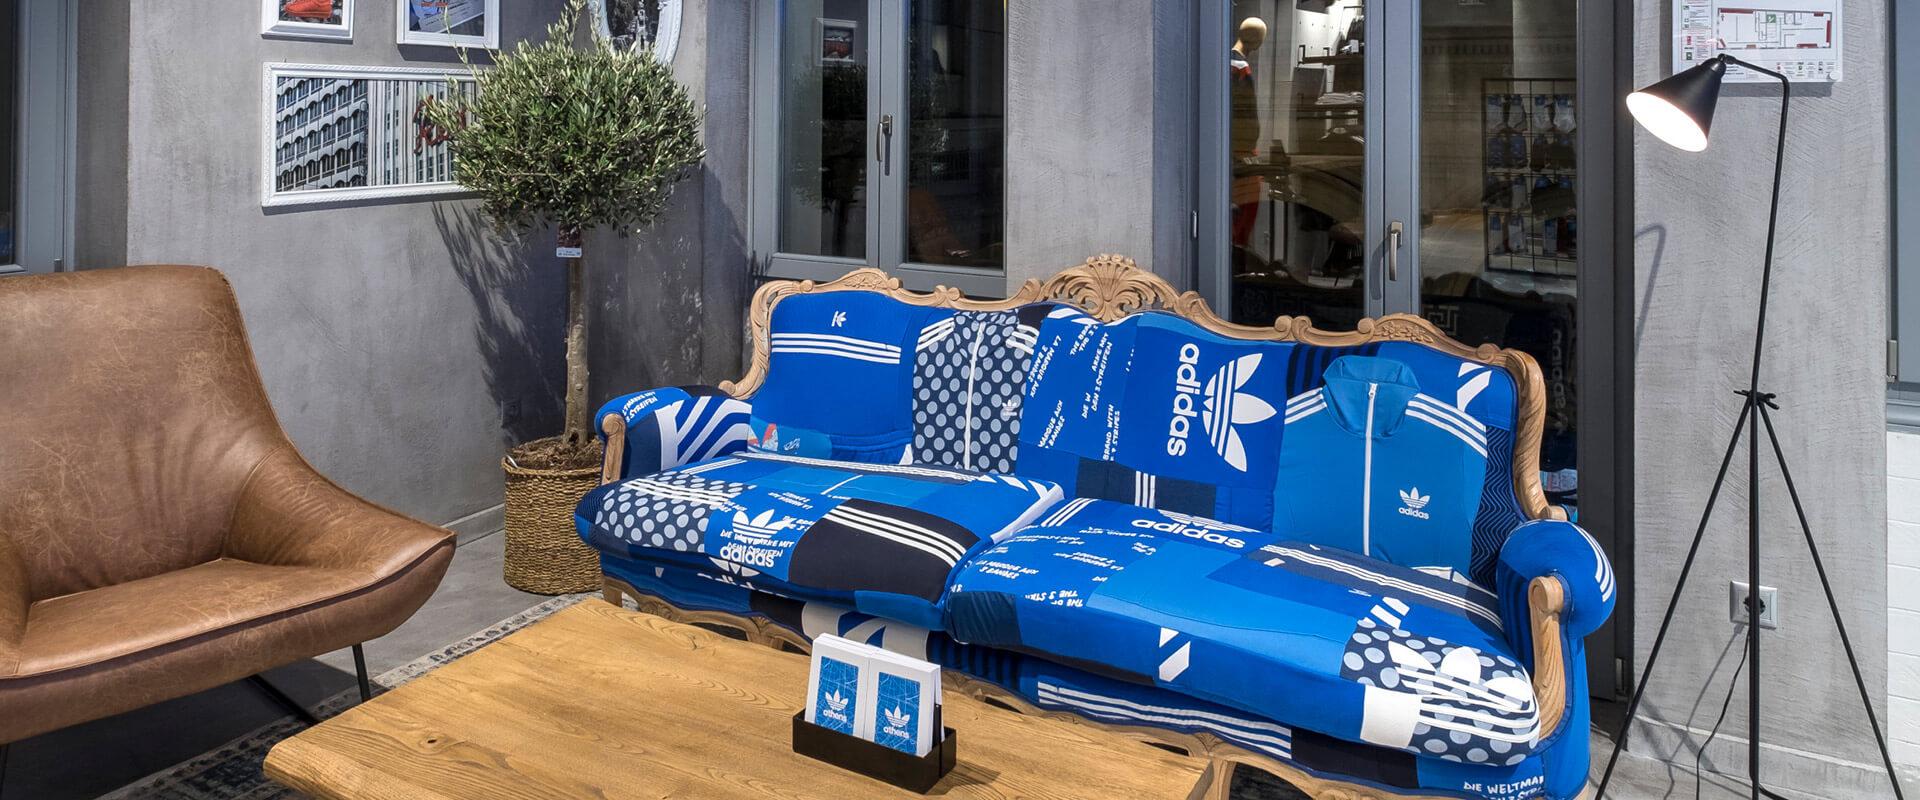 adidas shop athens greece